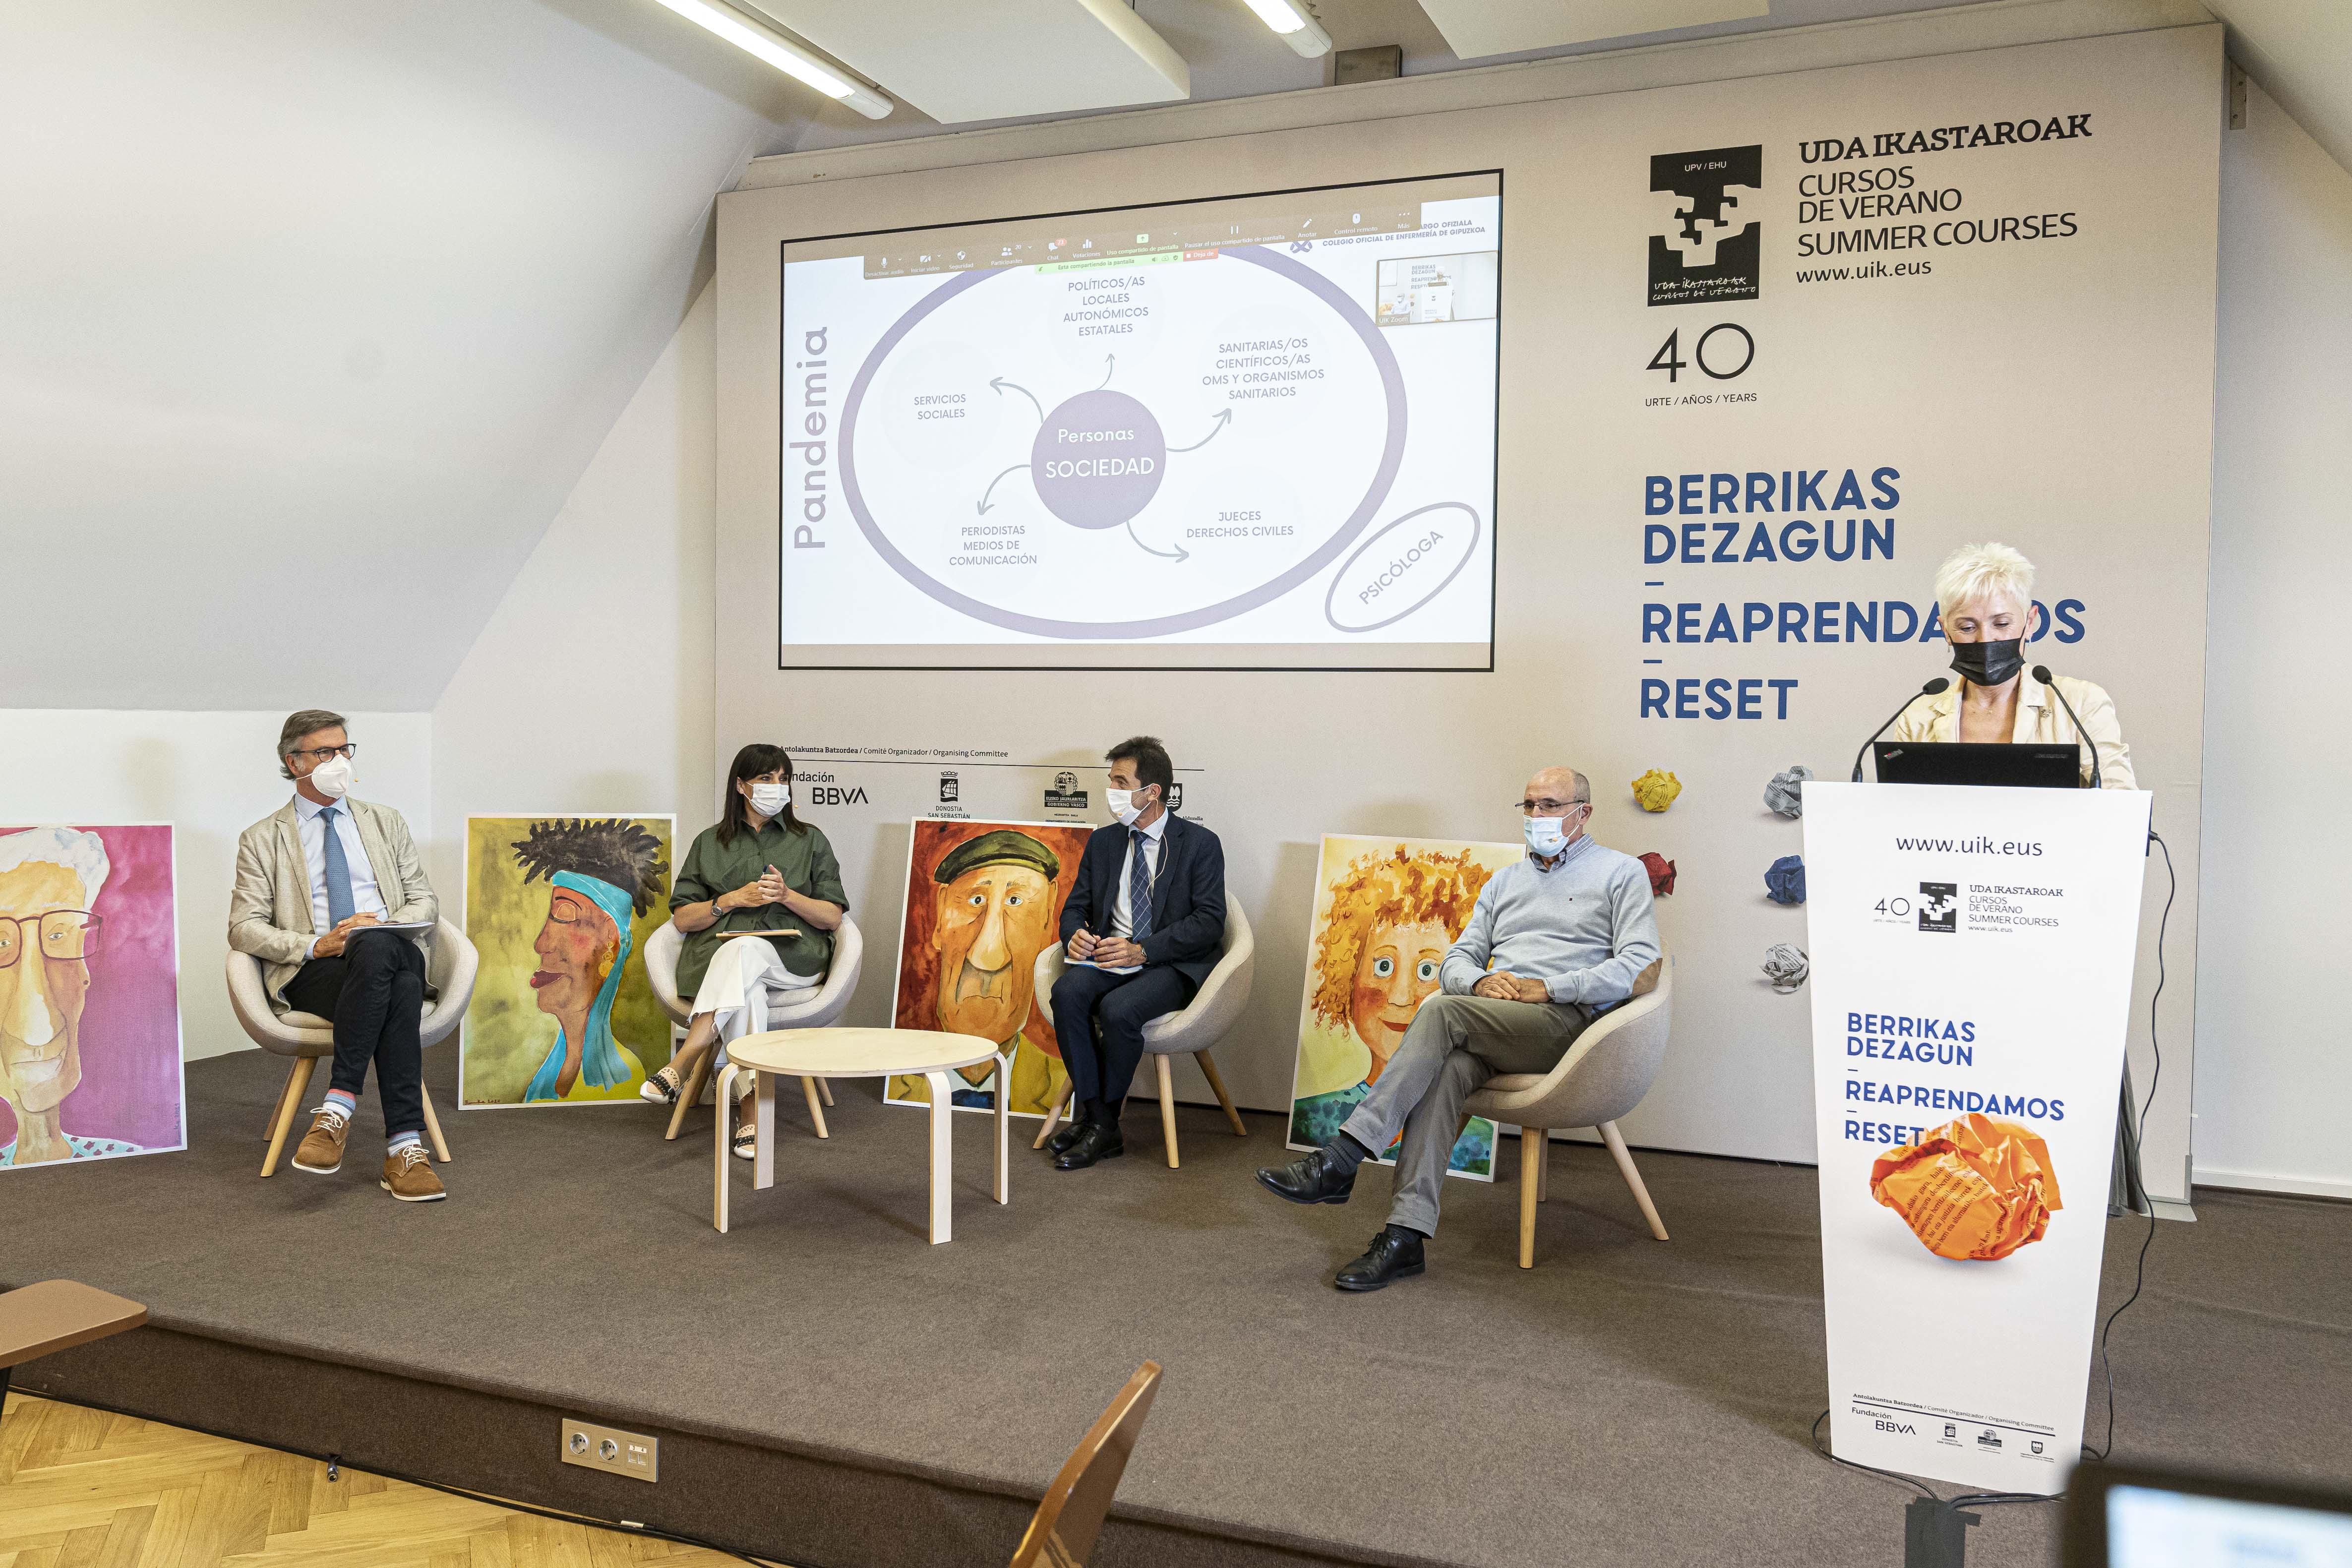 Rafael Bengoa, Gurutz Linazasoro, Estibaliz Ruiz, Mª Pilar Lekuona y Juan Jose Alvarez